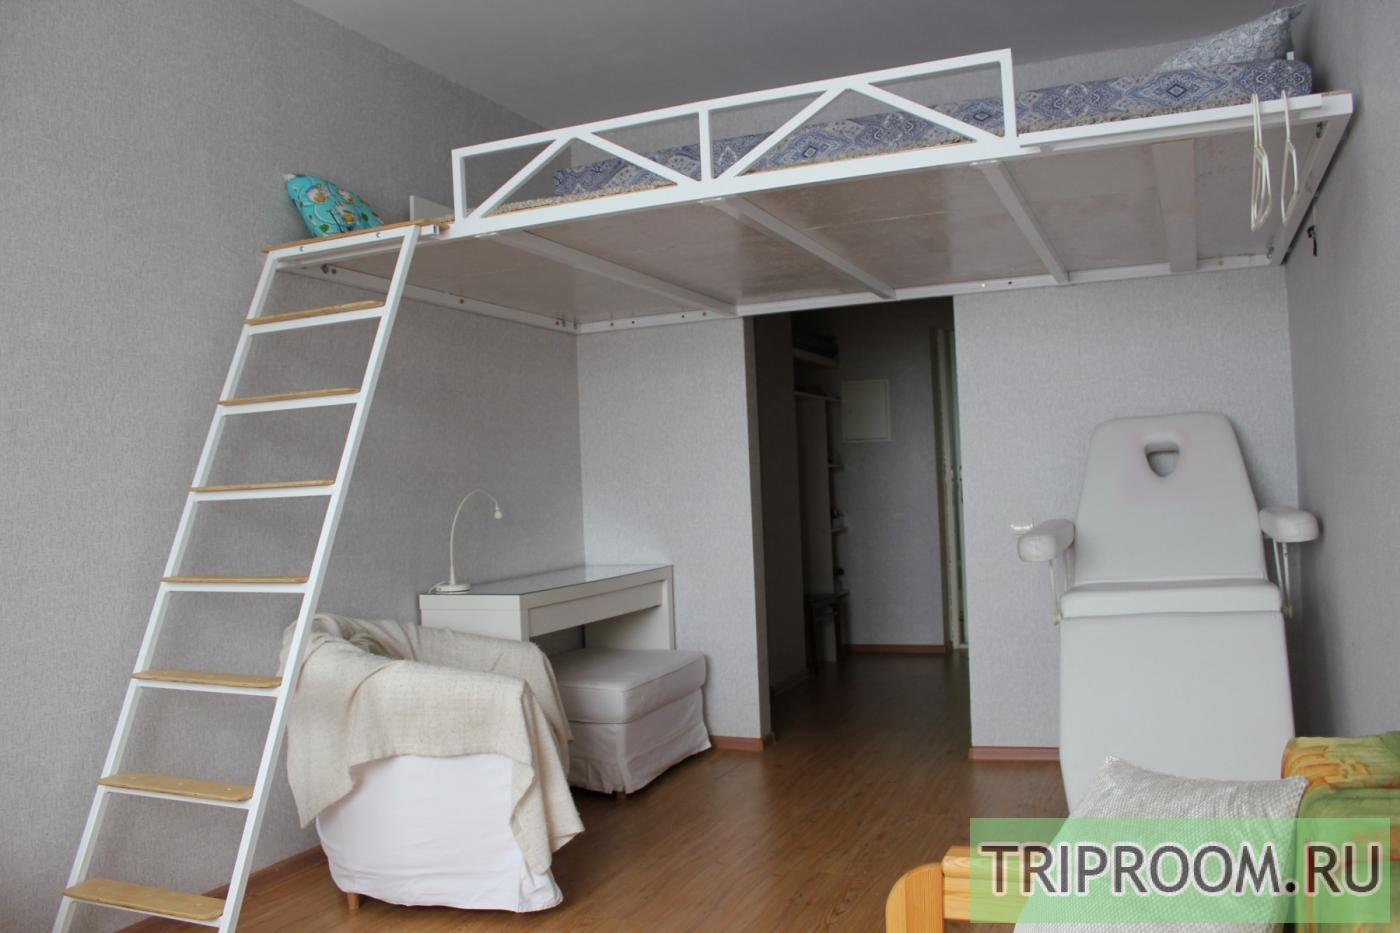 1-комнатная квартира посуточно (вариант № 34045), ул. Краснознаменная улица, фото № 4